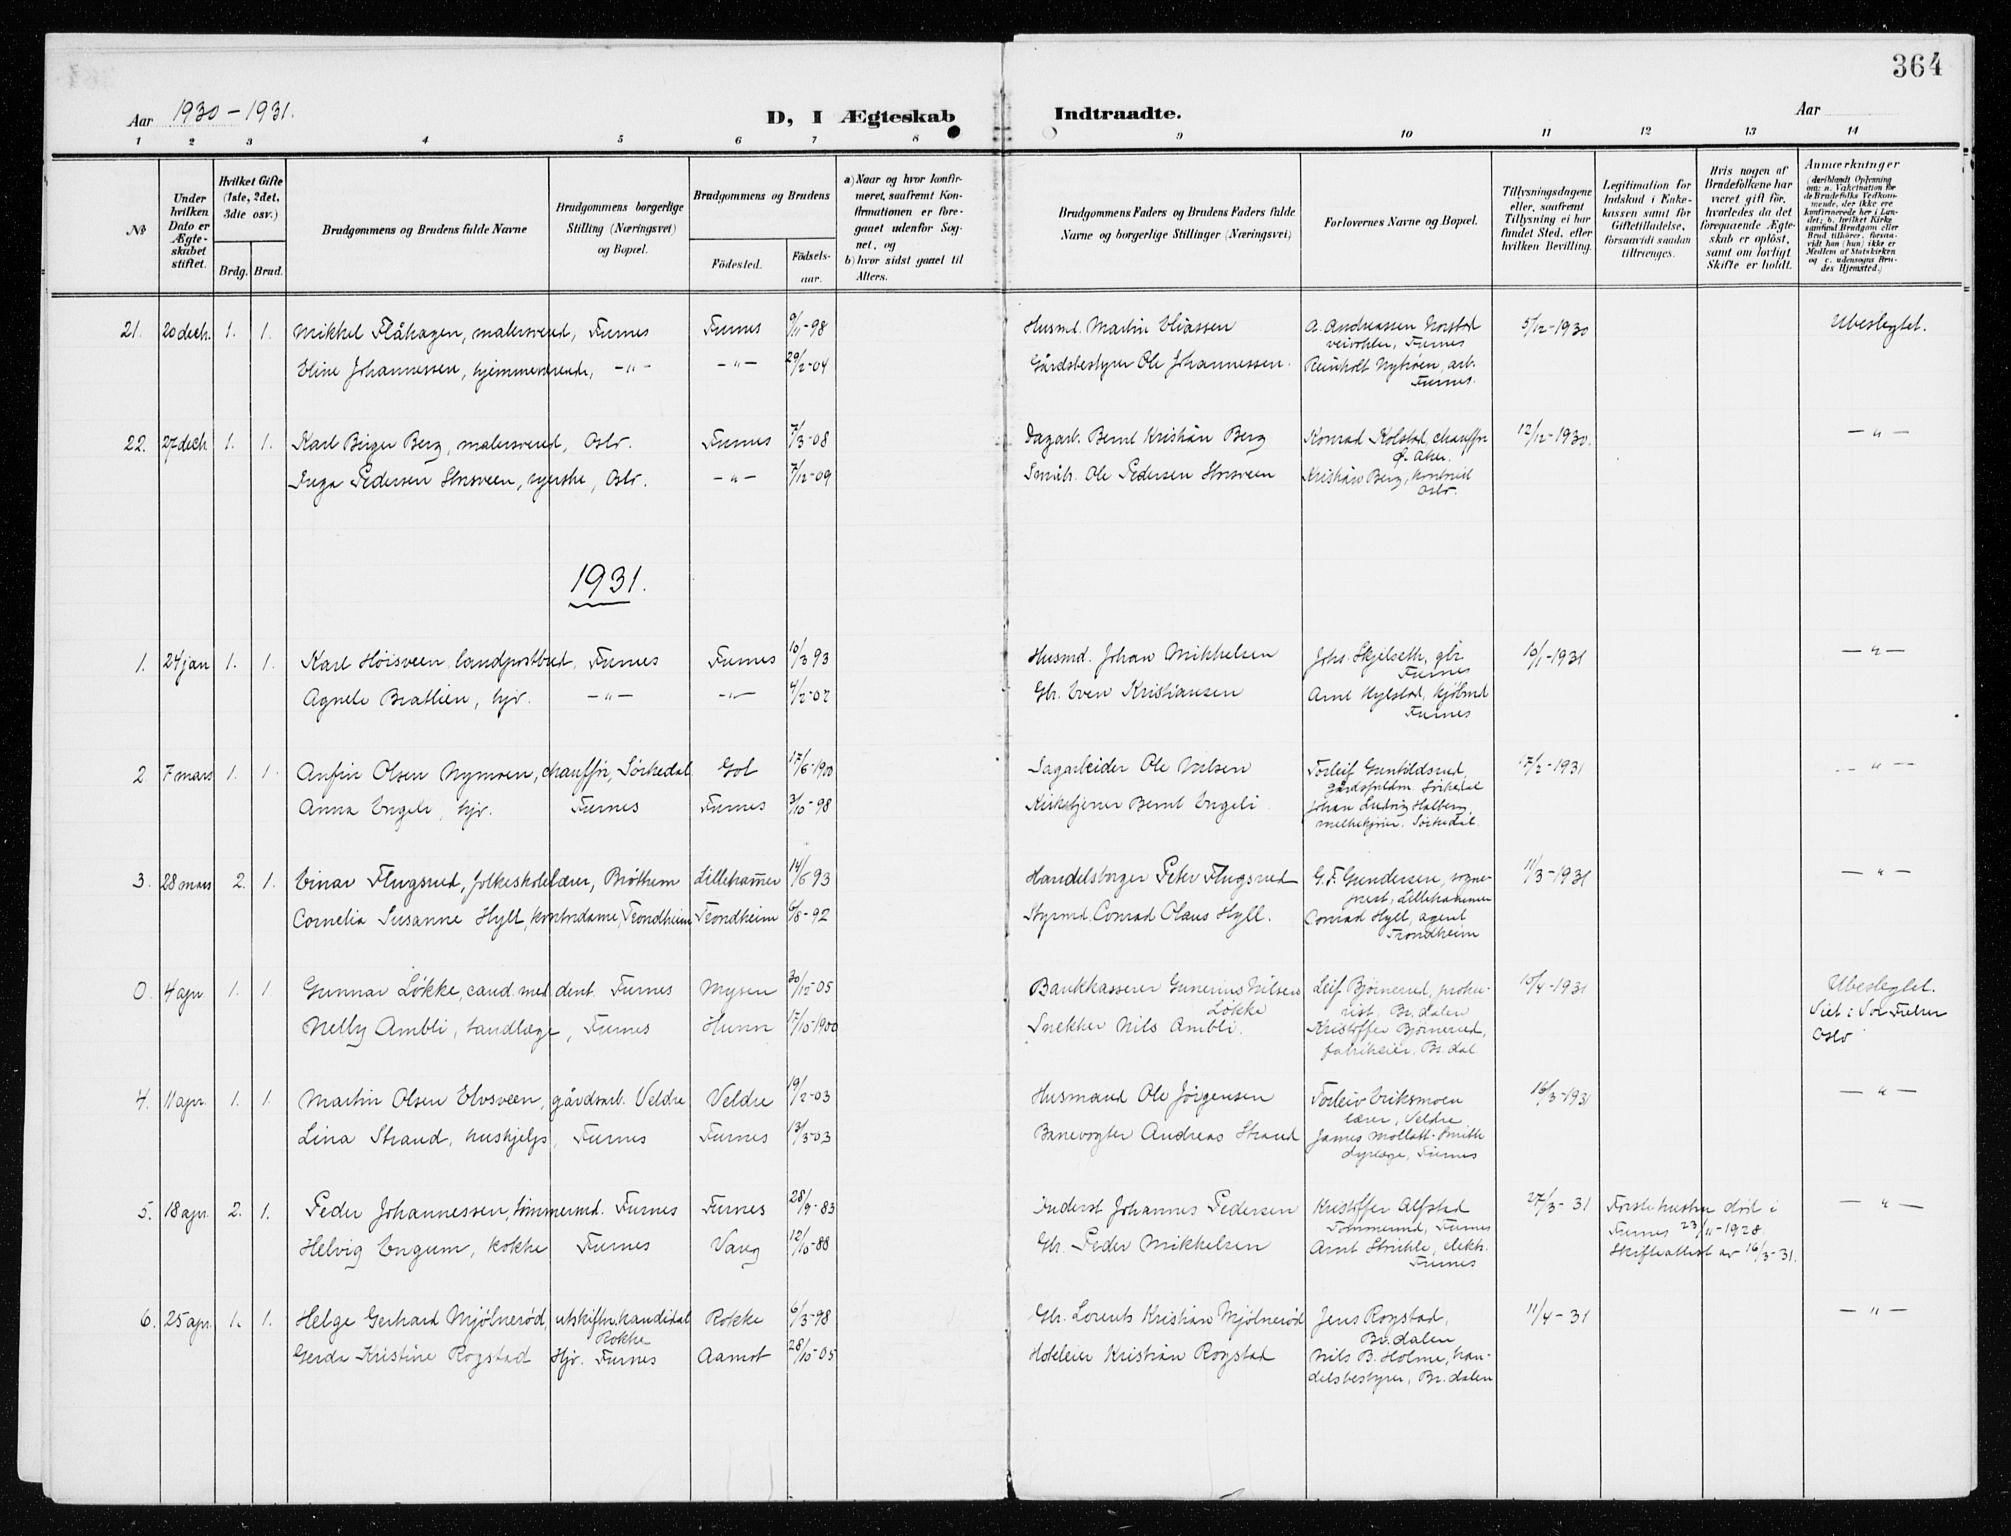 SAH, Furnes prestekontor, K/Ka/L0001: Ministerialbok nr. 1, 1907-1935, s. 364